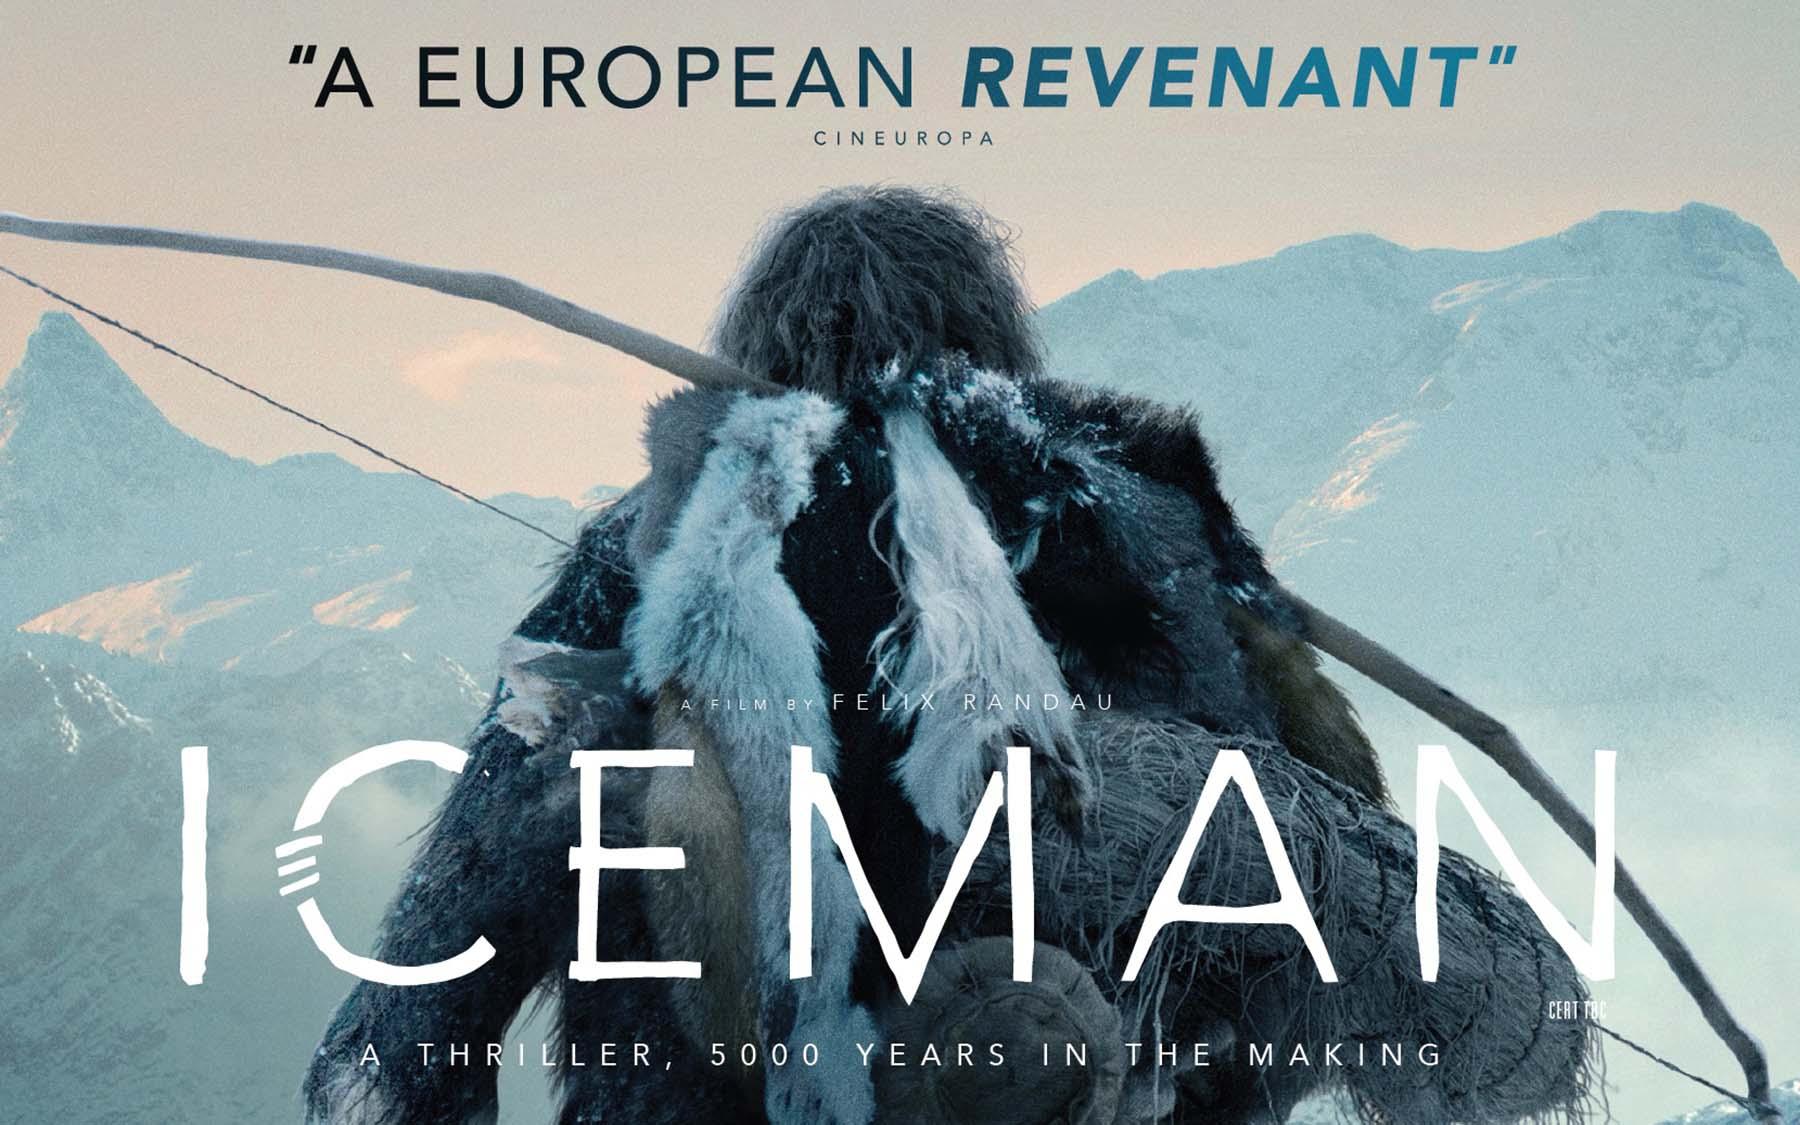 Iceman 2019 film Ötzi